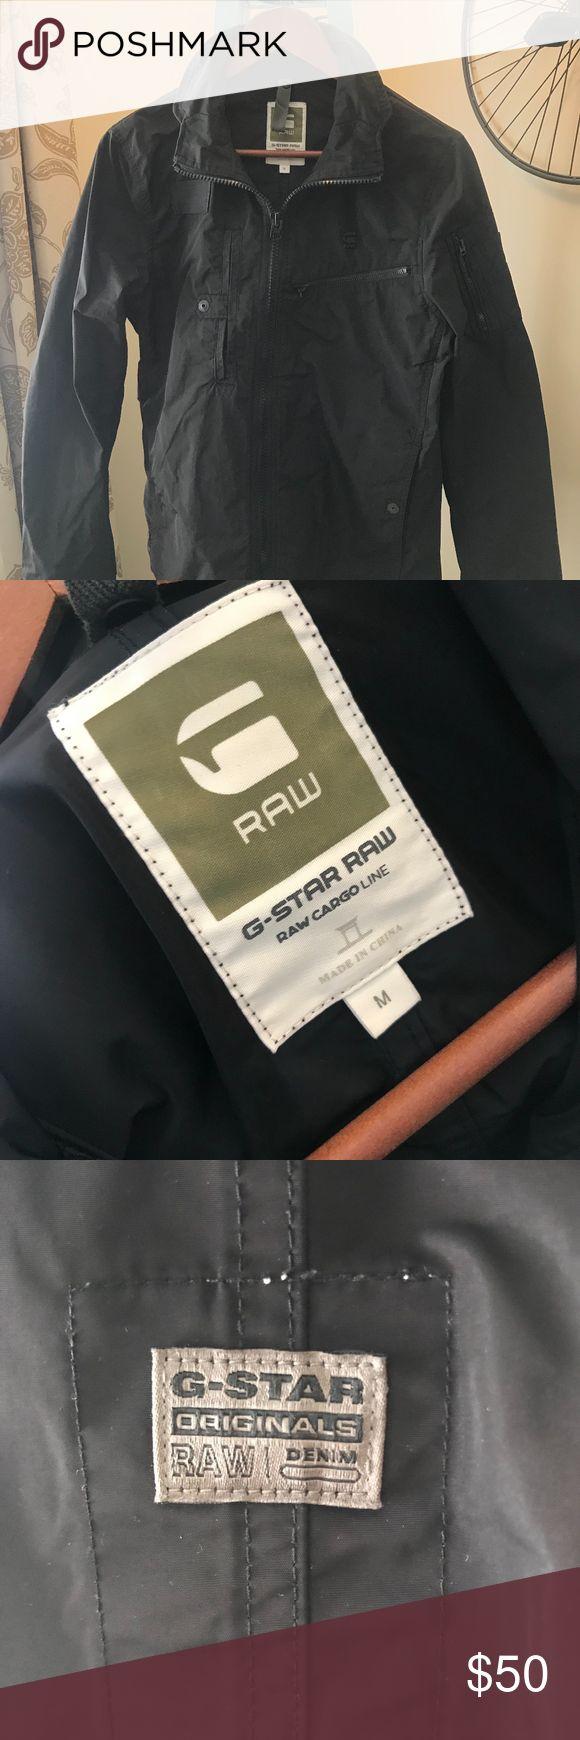 G-Star Raw Cargo Jacket G- Star Cargo Line Jacket in great shape. Size Medium G-Star Jackets & Coats Military & Field